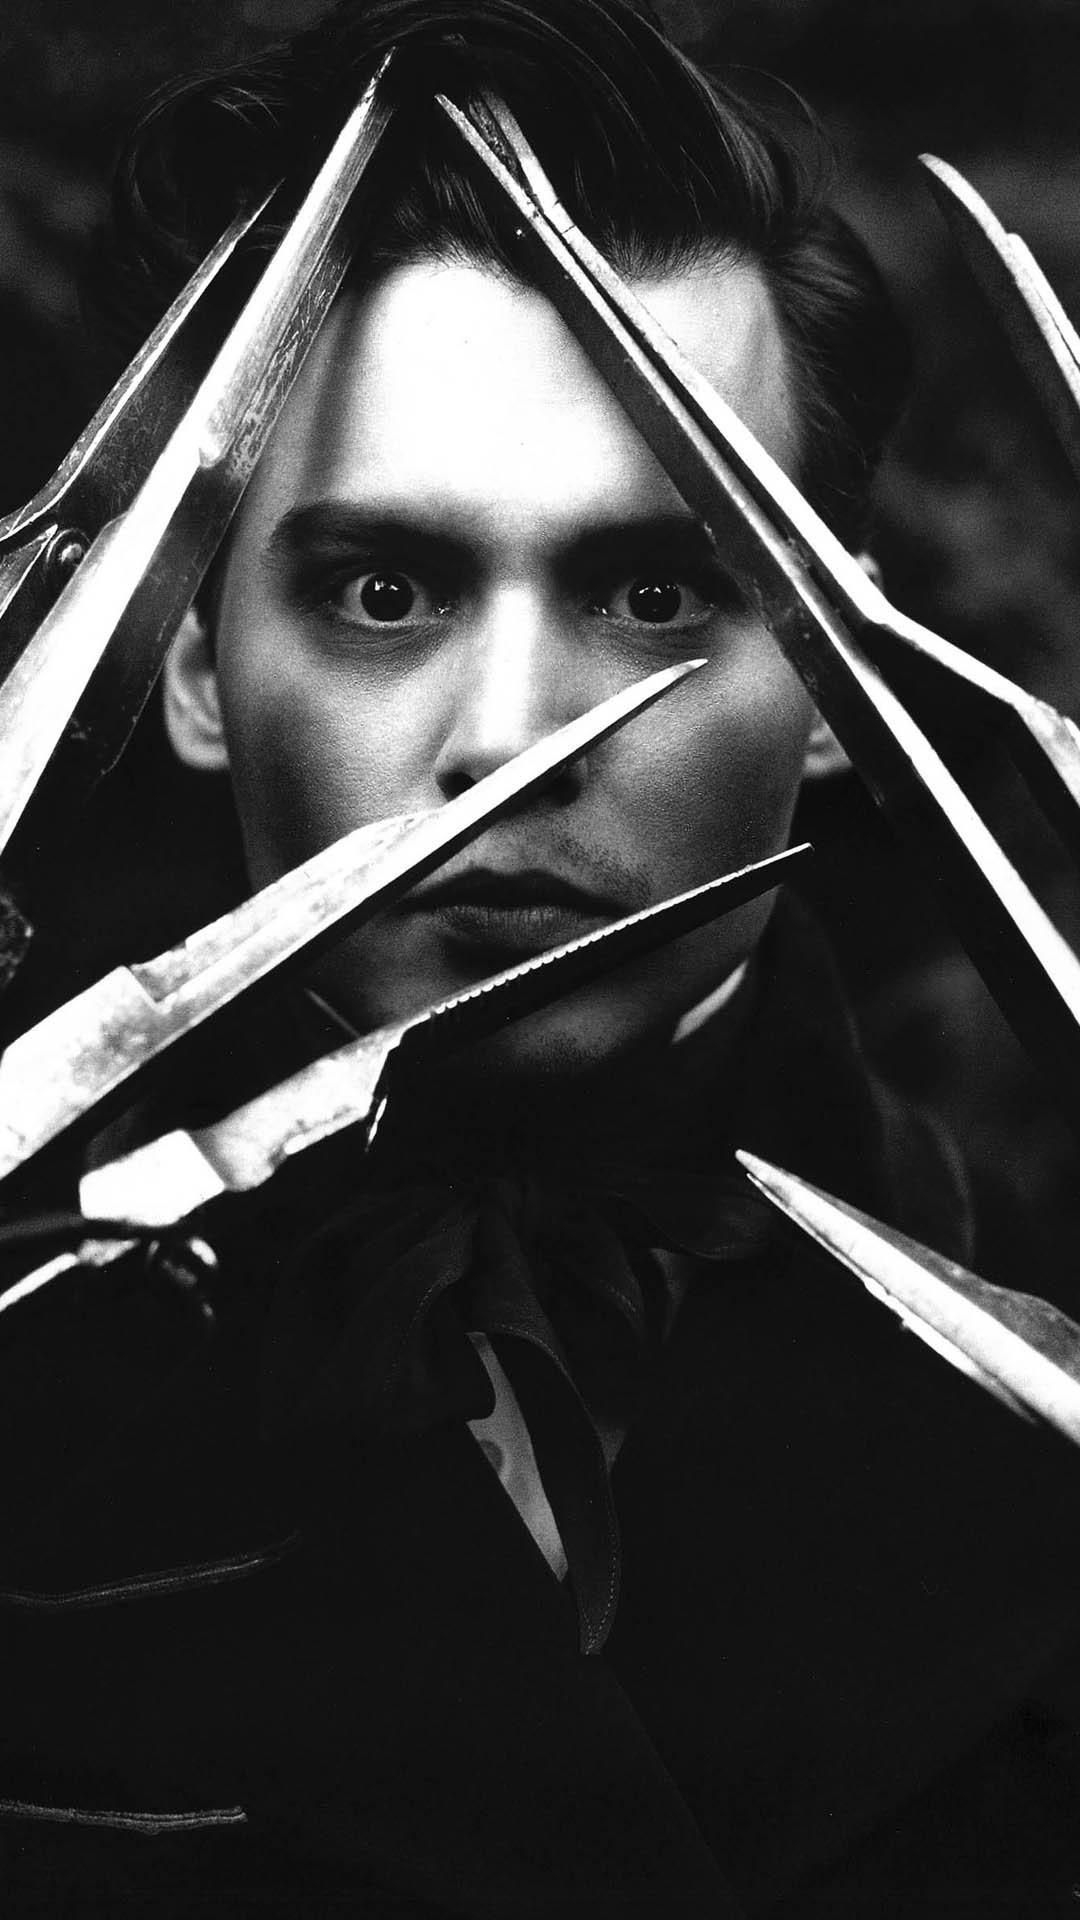 Free Download Showing Gallery For Johnny Depp Edward Scissorhands